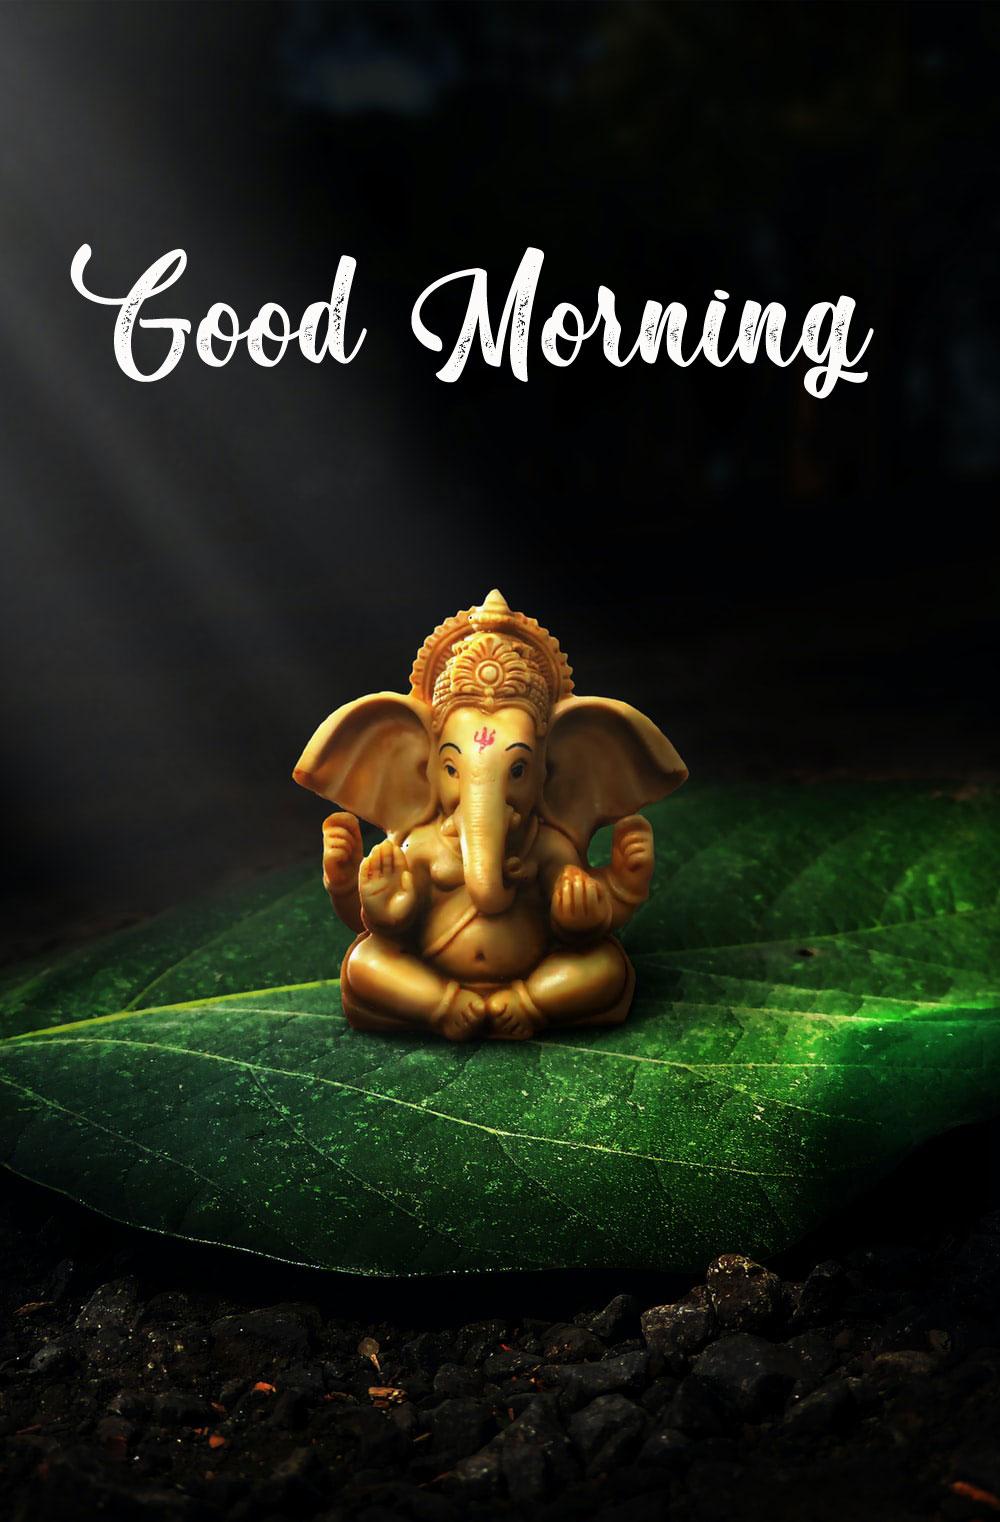 2021 download New ganesha good morning images